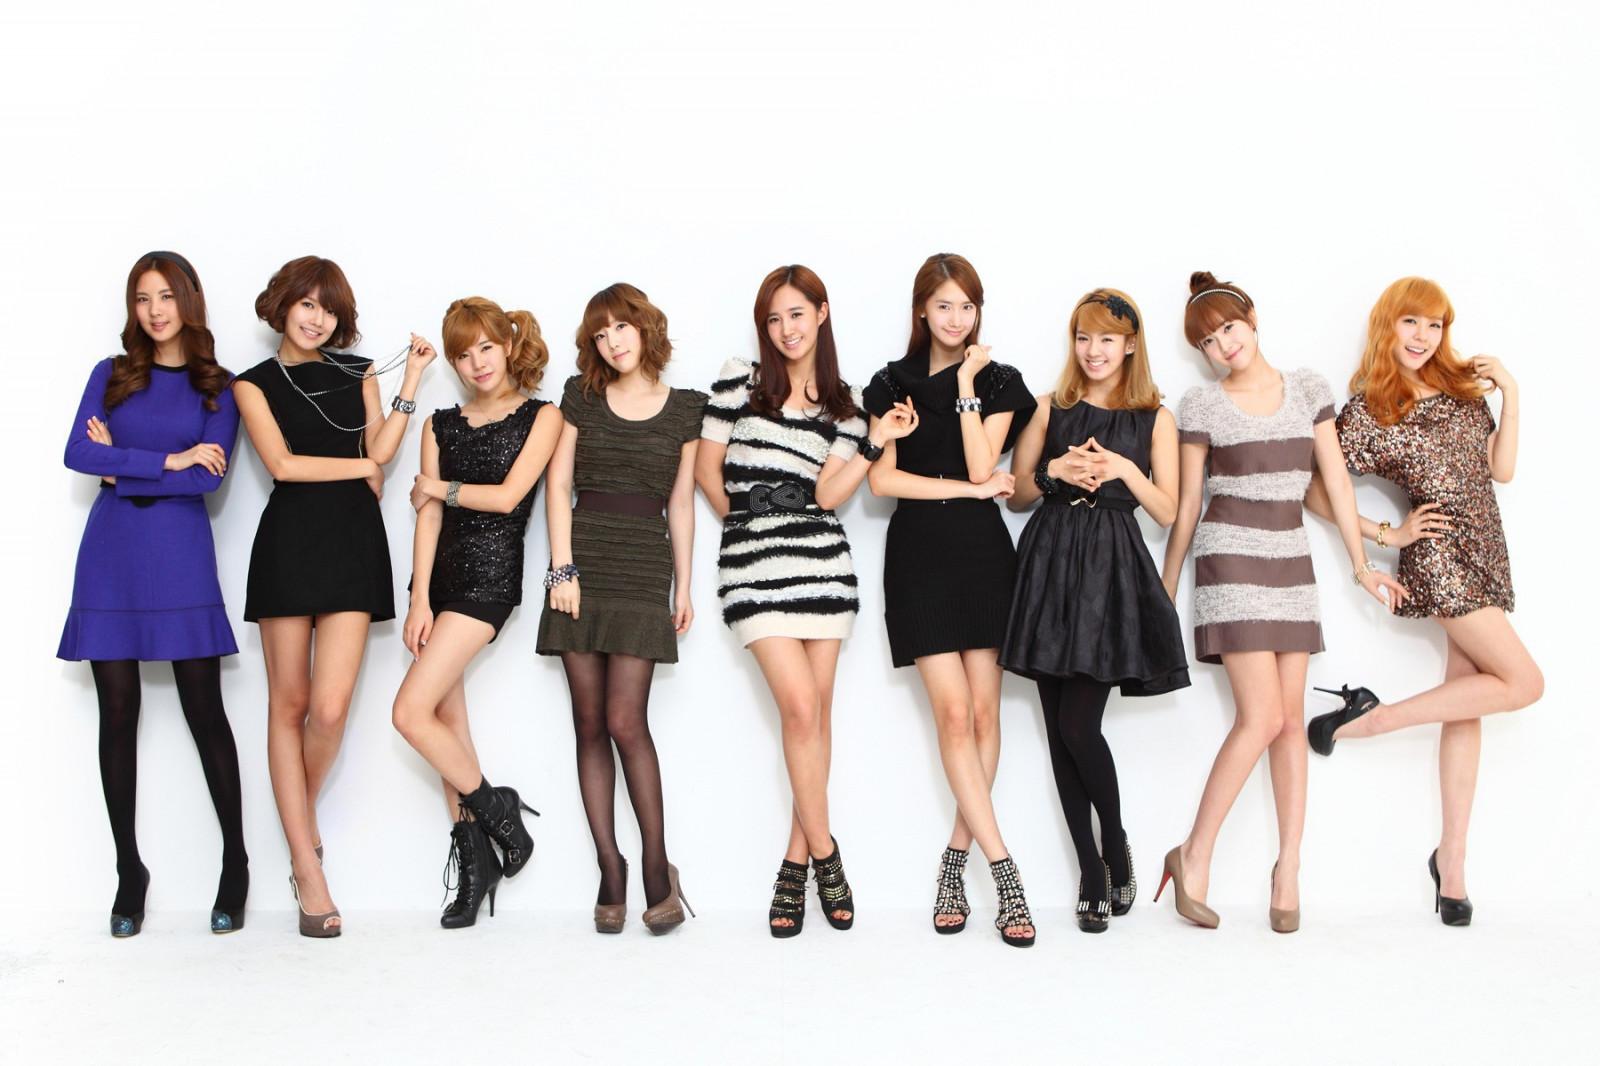 Sunny choi fashion designer 44